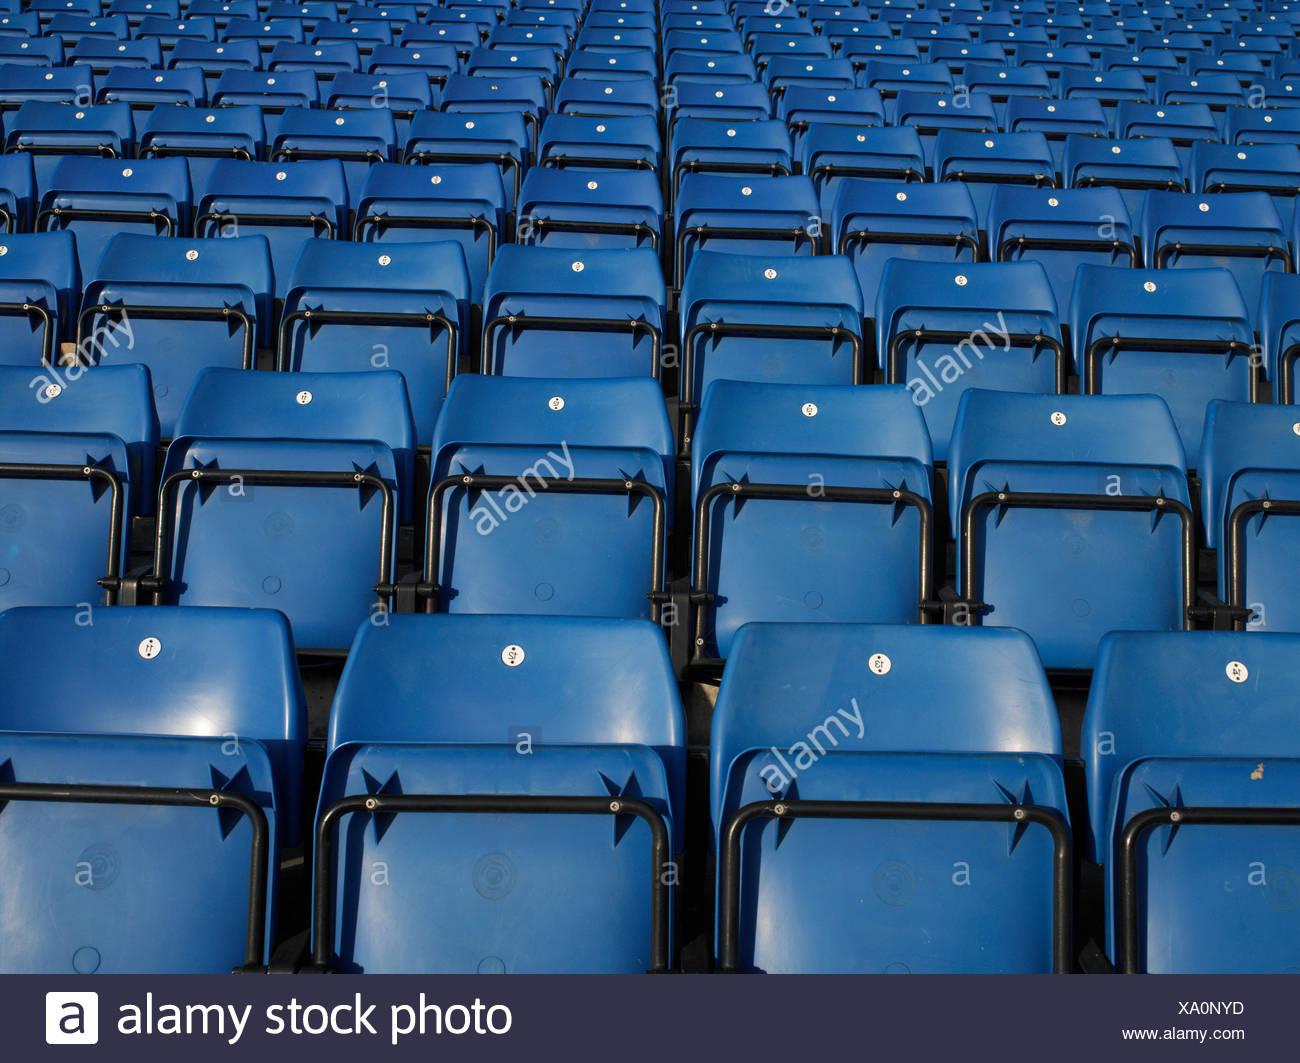 Empty stadium seating - Stock Image